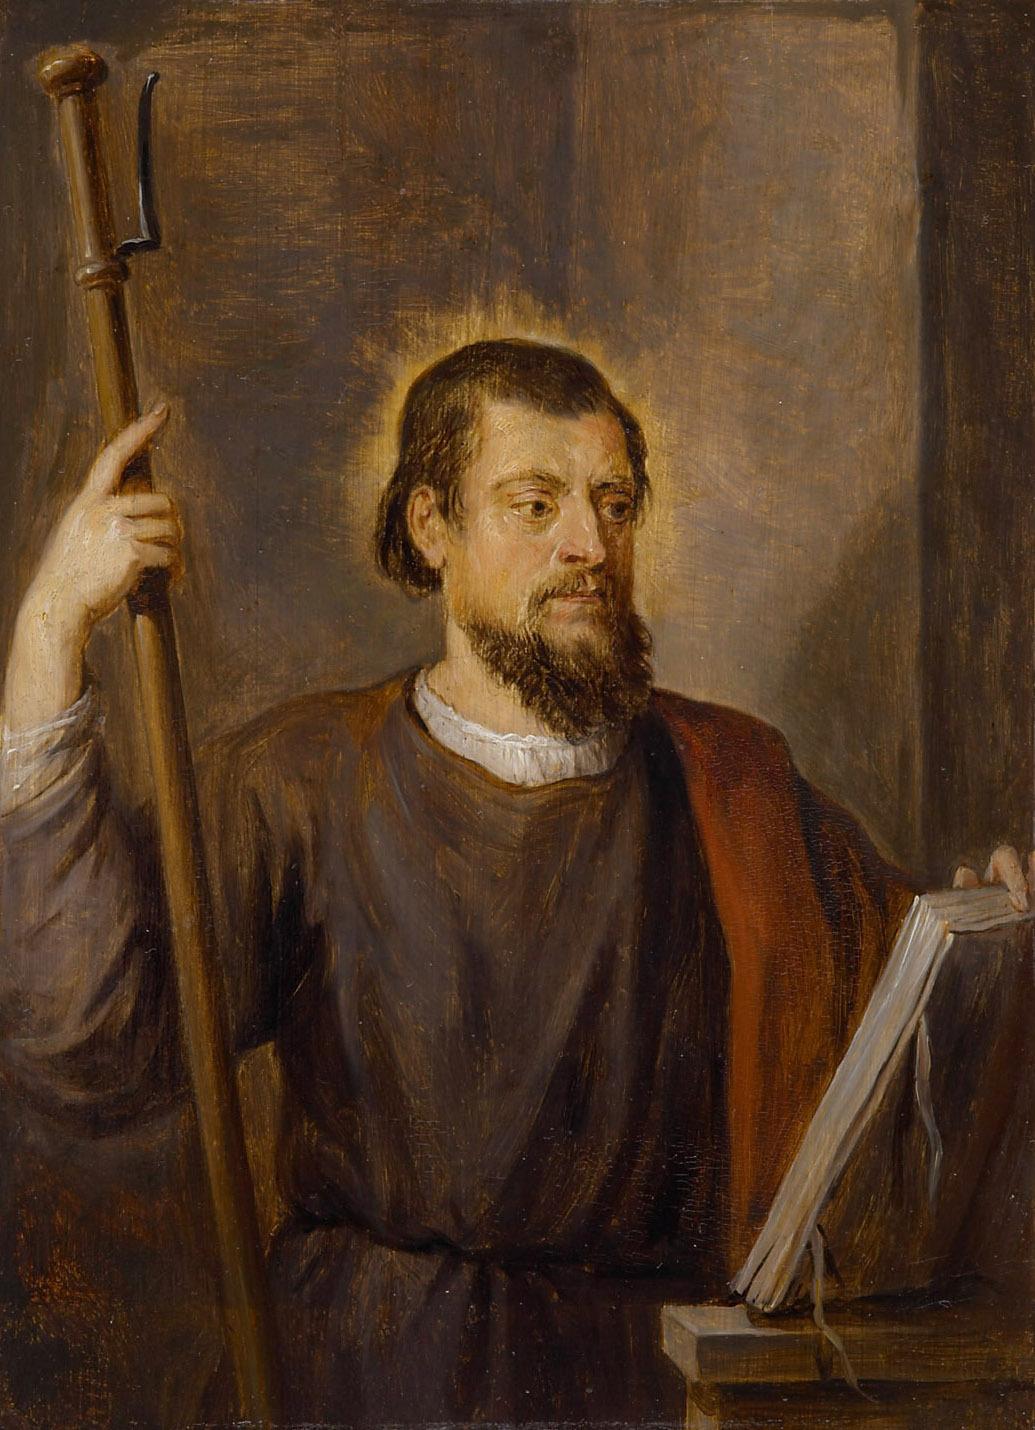 Der Orator Francesco Filetto von David Teniers d. J.